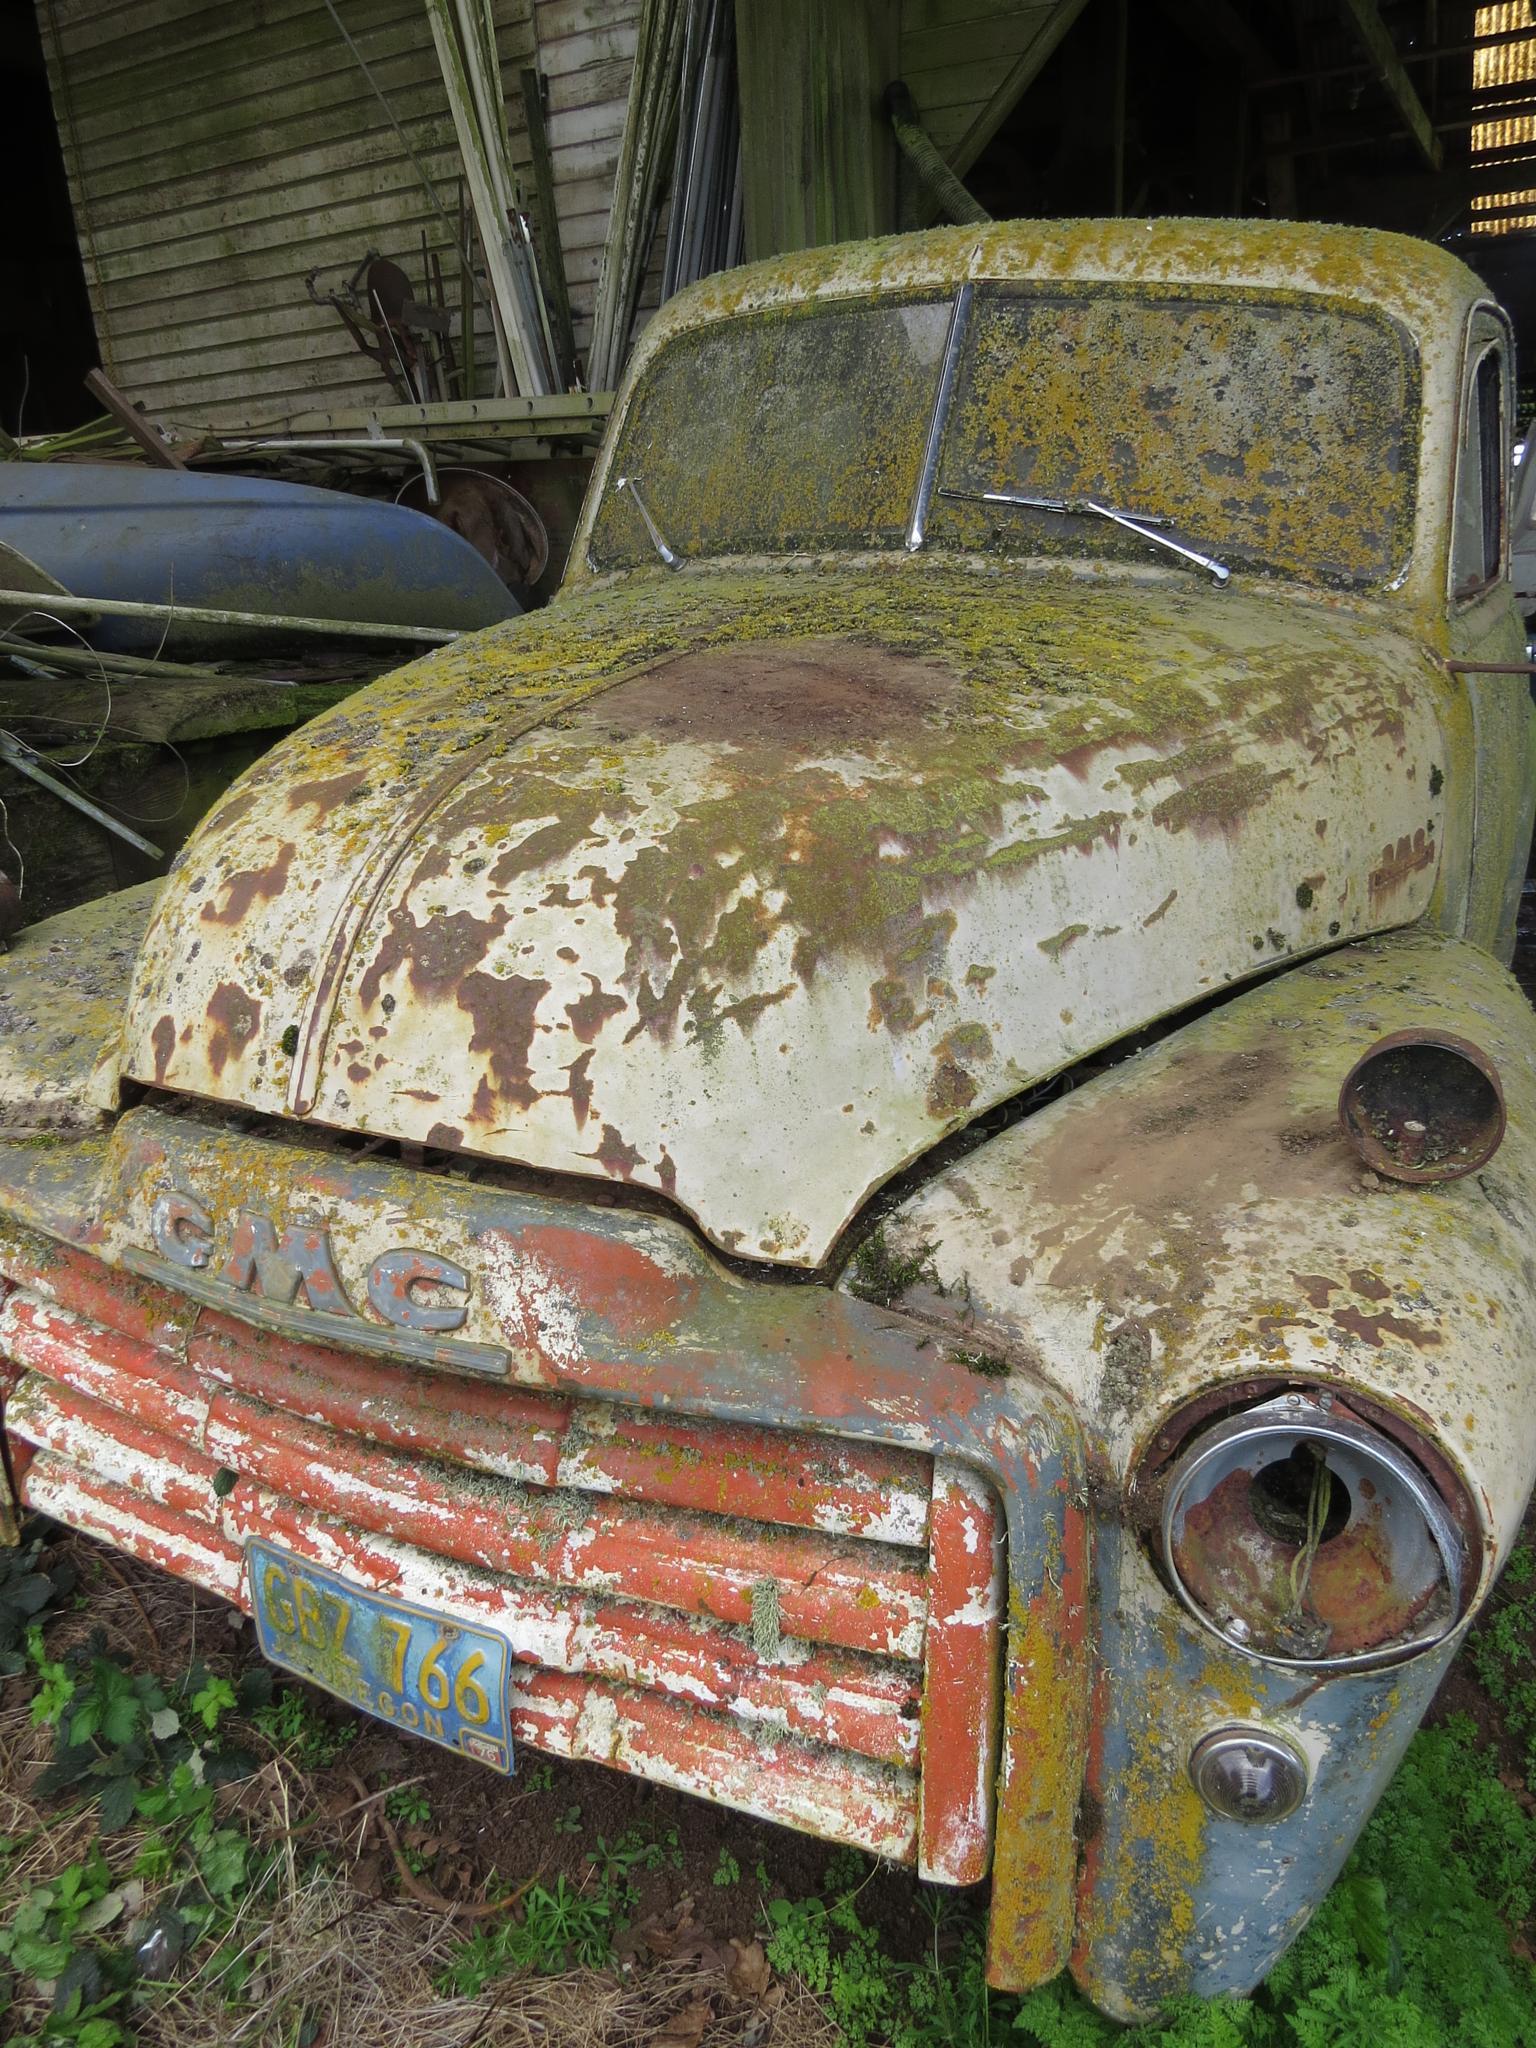 Old truck in barn by christine.rayburn.167